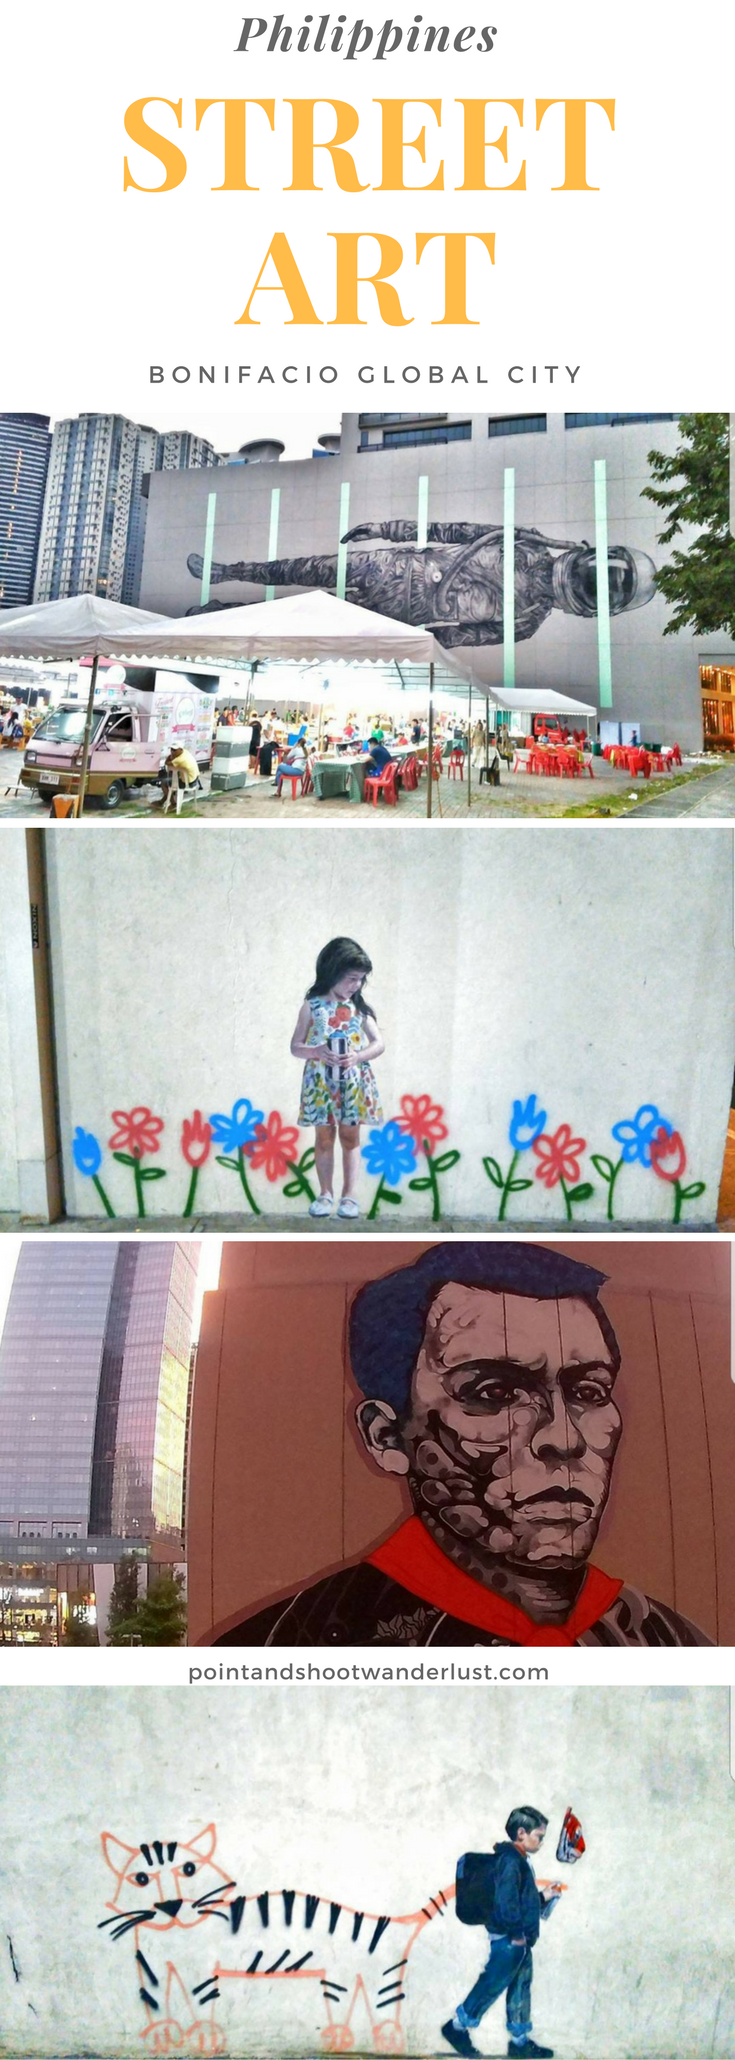 Street Art | Philippines | Bonifacio Global City Street Art | BGC Street Art | Street Photography | Where to find street art in Philippines | Asia | Southeast Asia | Art